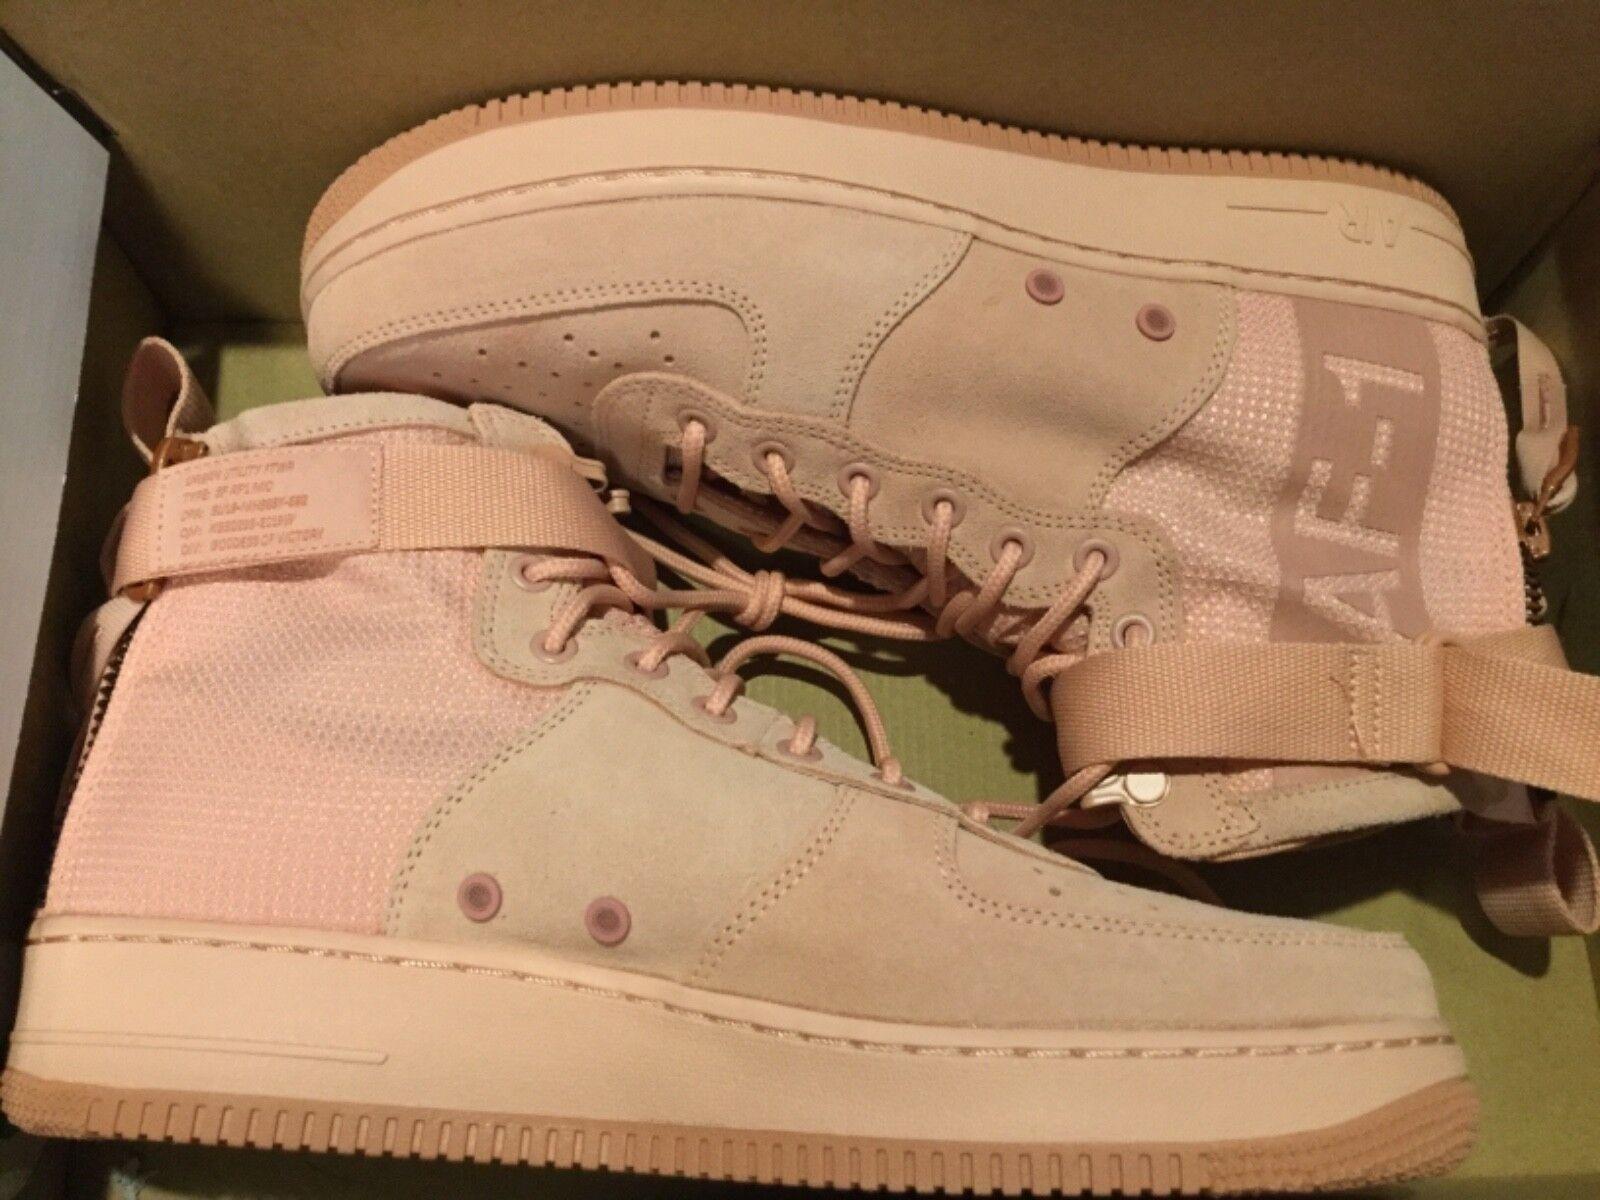 new styles 71048 b2a31 New Nike SF SF SF Air Force 1 AF1 Mid Suede shoes AJ9502-600 Sz